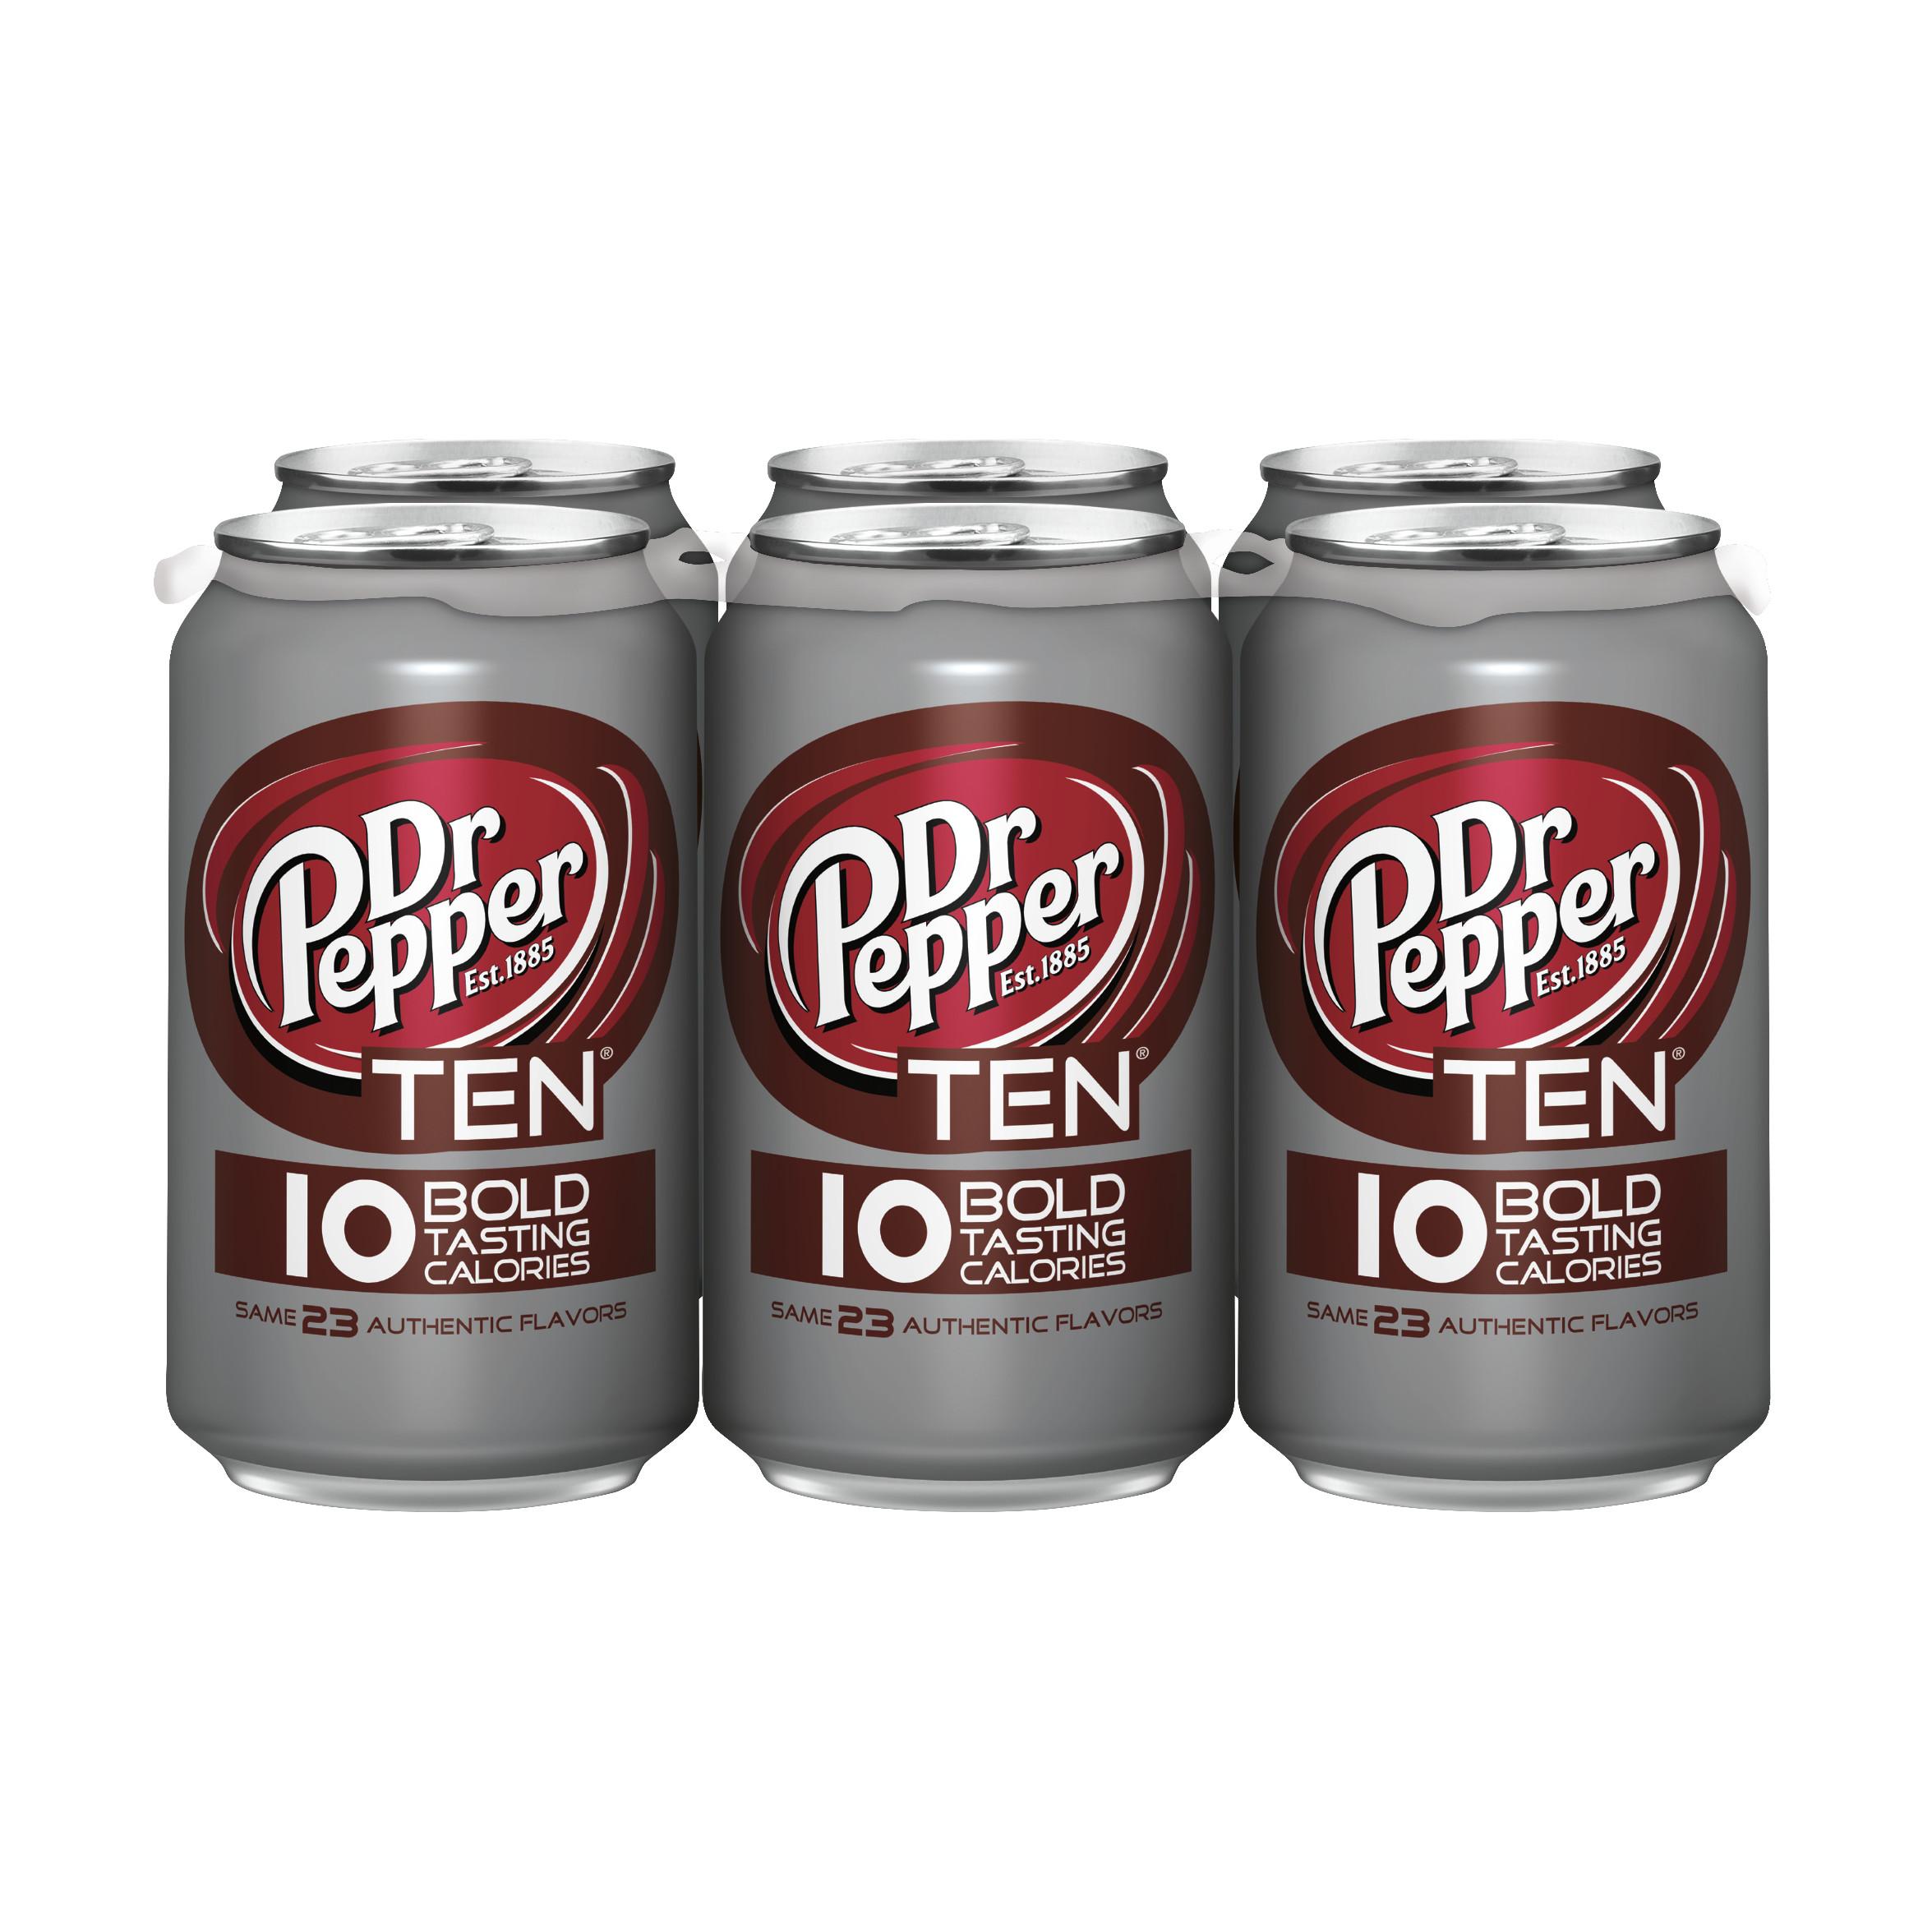 Dr Pepper TEN, 12 fl oz, 6 pack